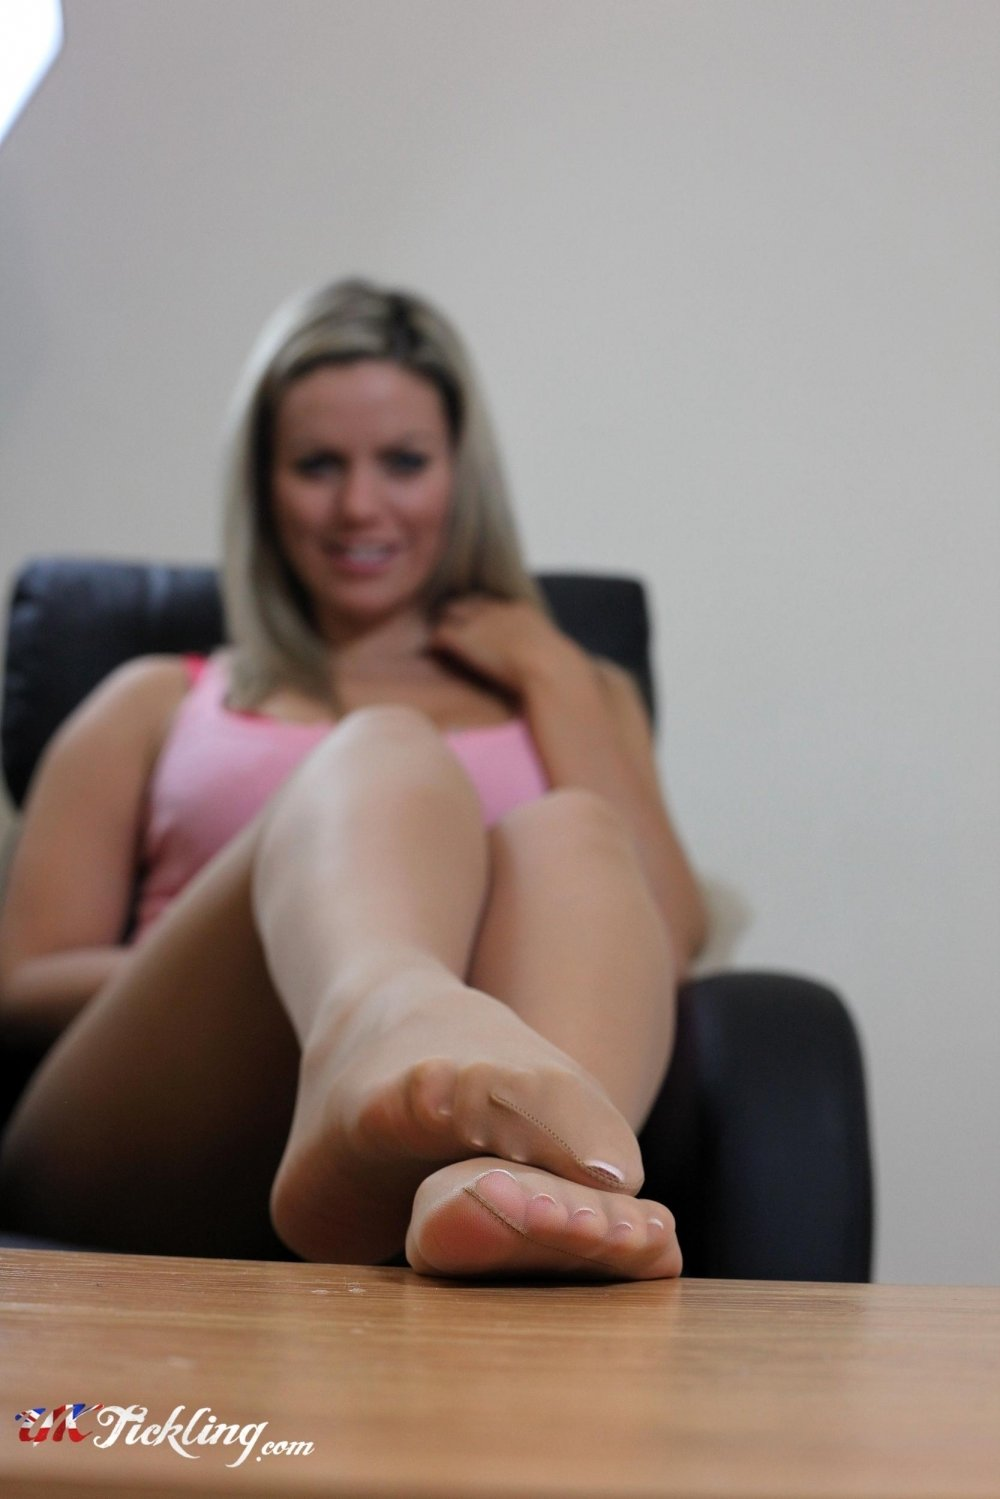 Izzy Uk Tickling Classy free izzy pictures, free sex gallery @ sexybabegirls